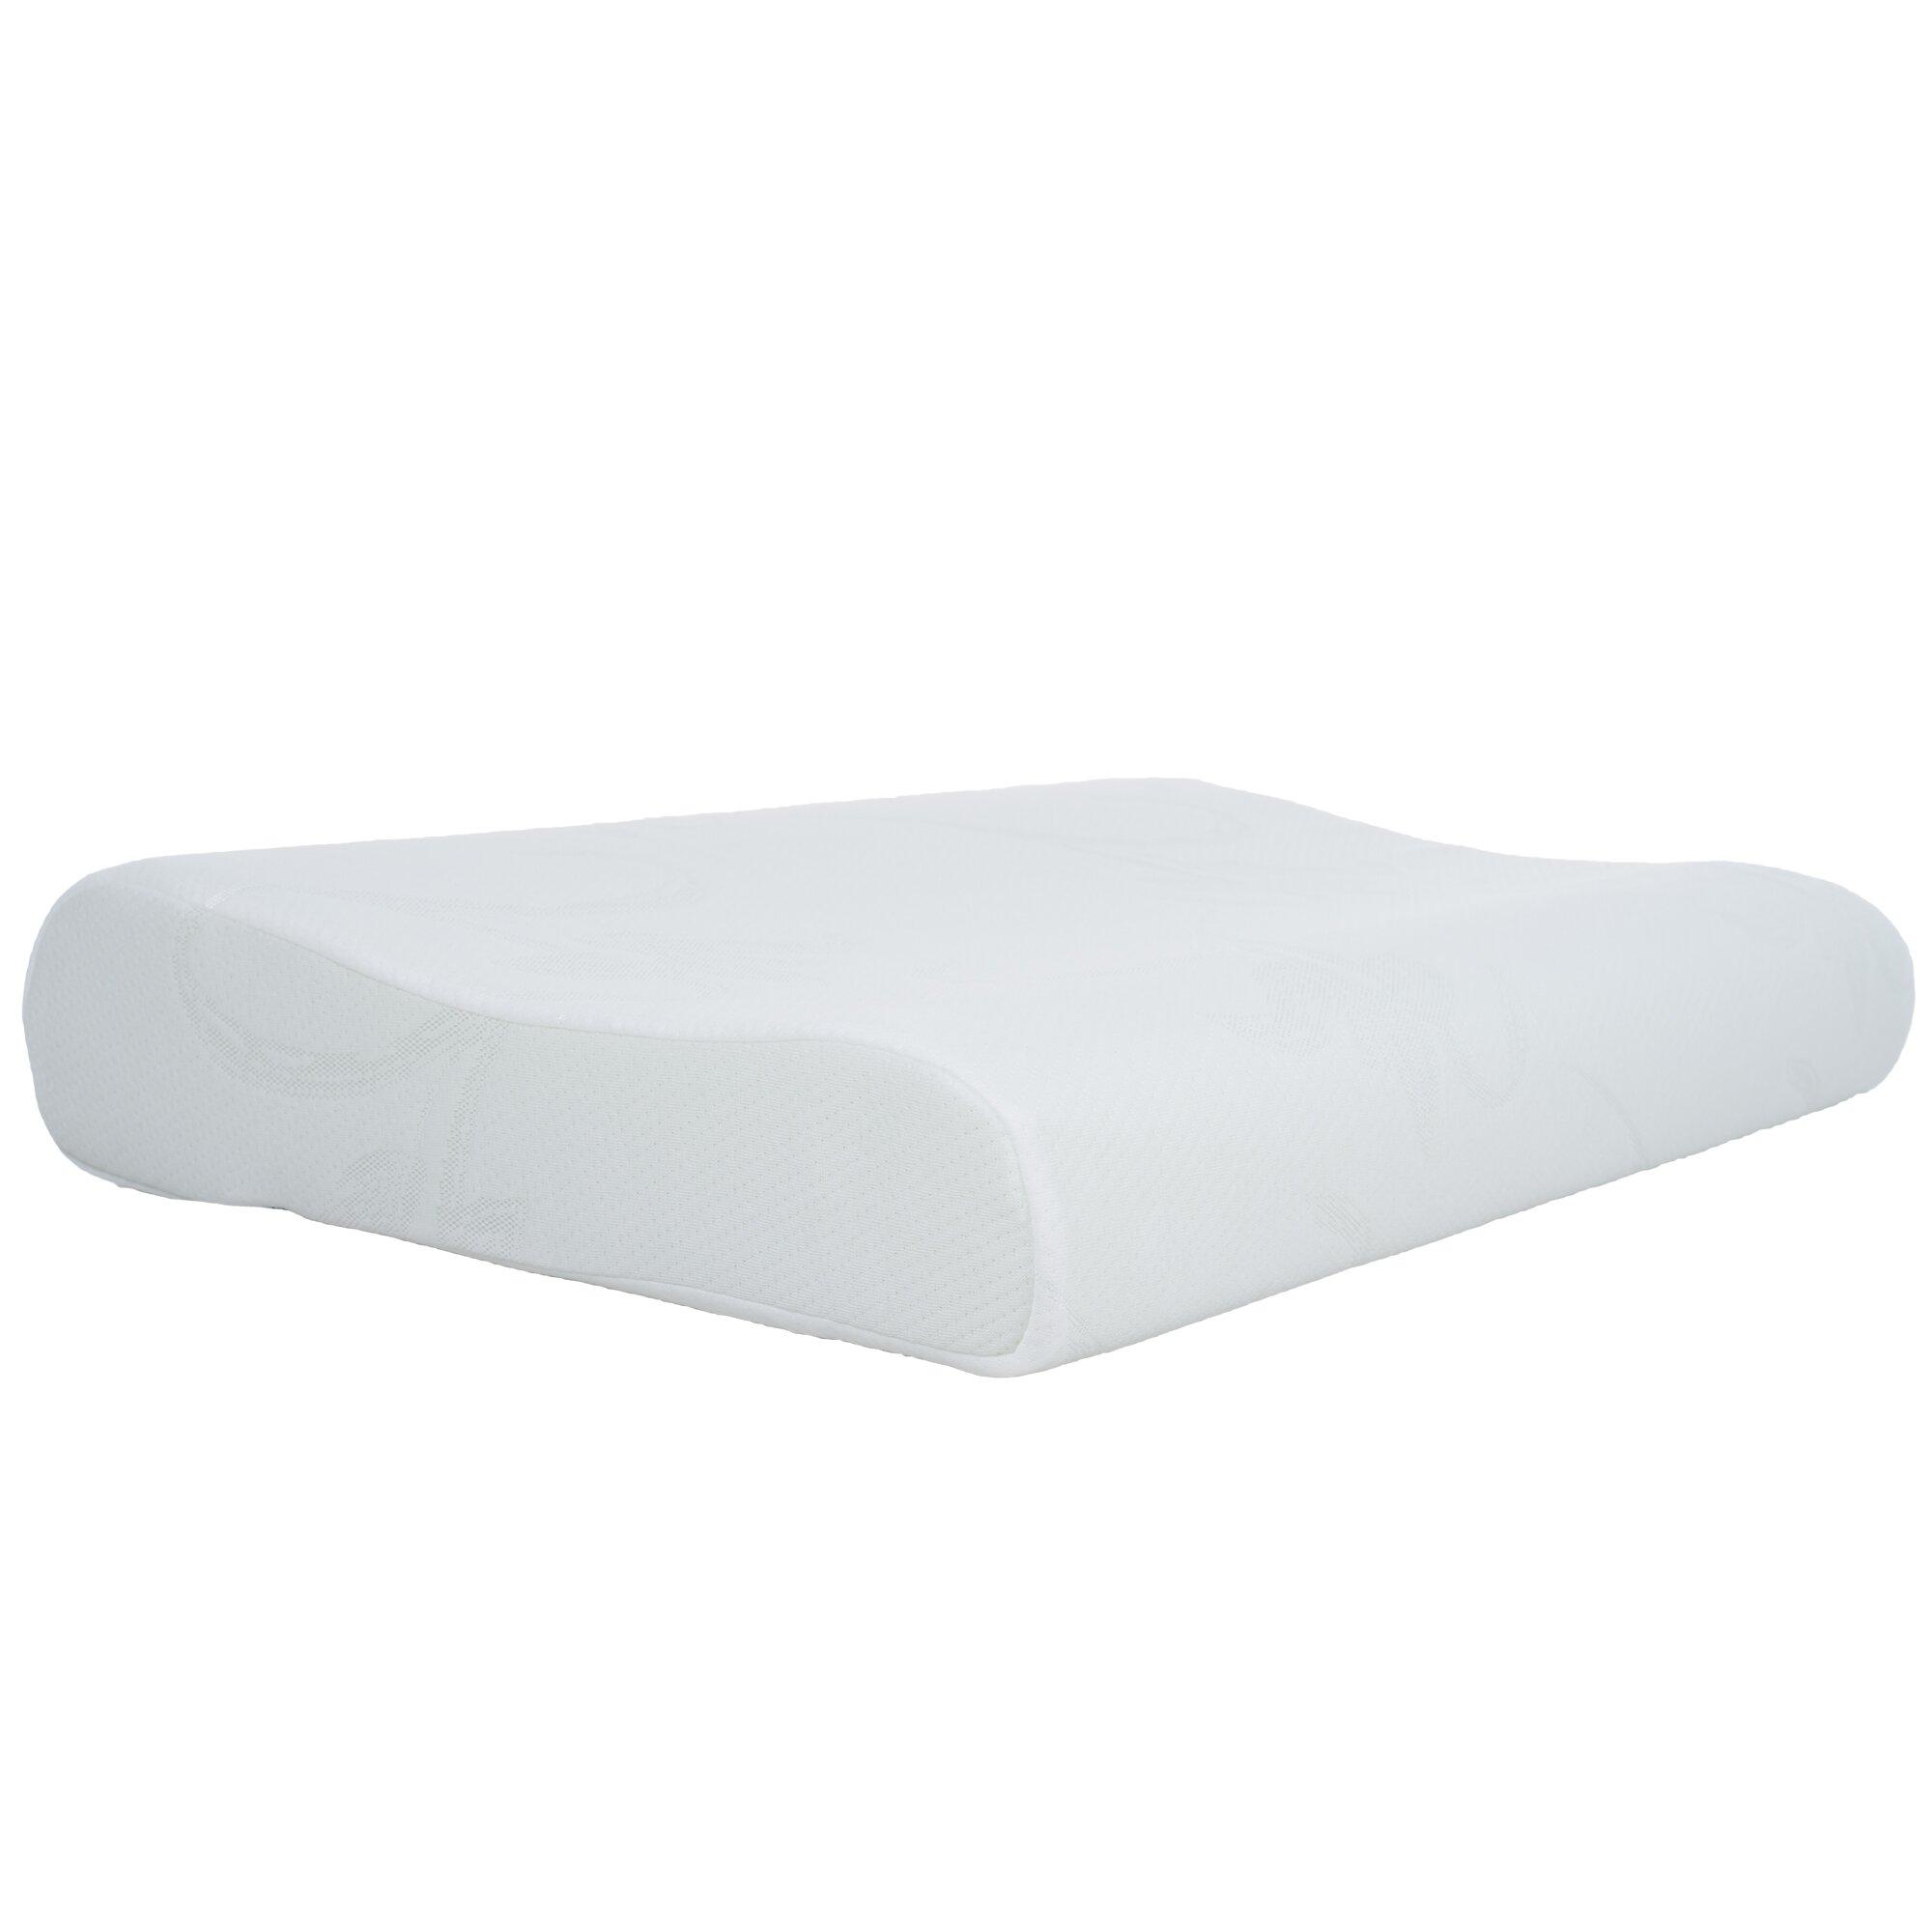 remedy memory foam contour pillow wayfair. Black Bedroom Furniture Sets. Home Design Ideas